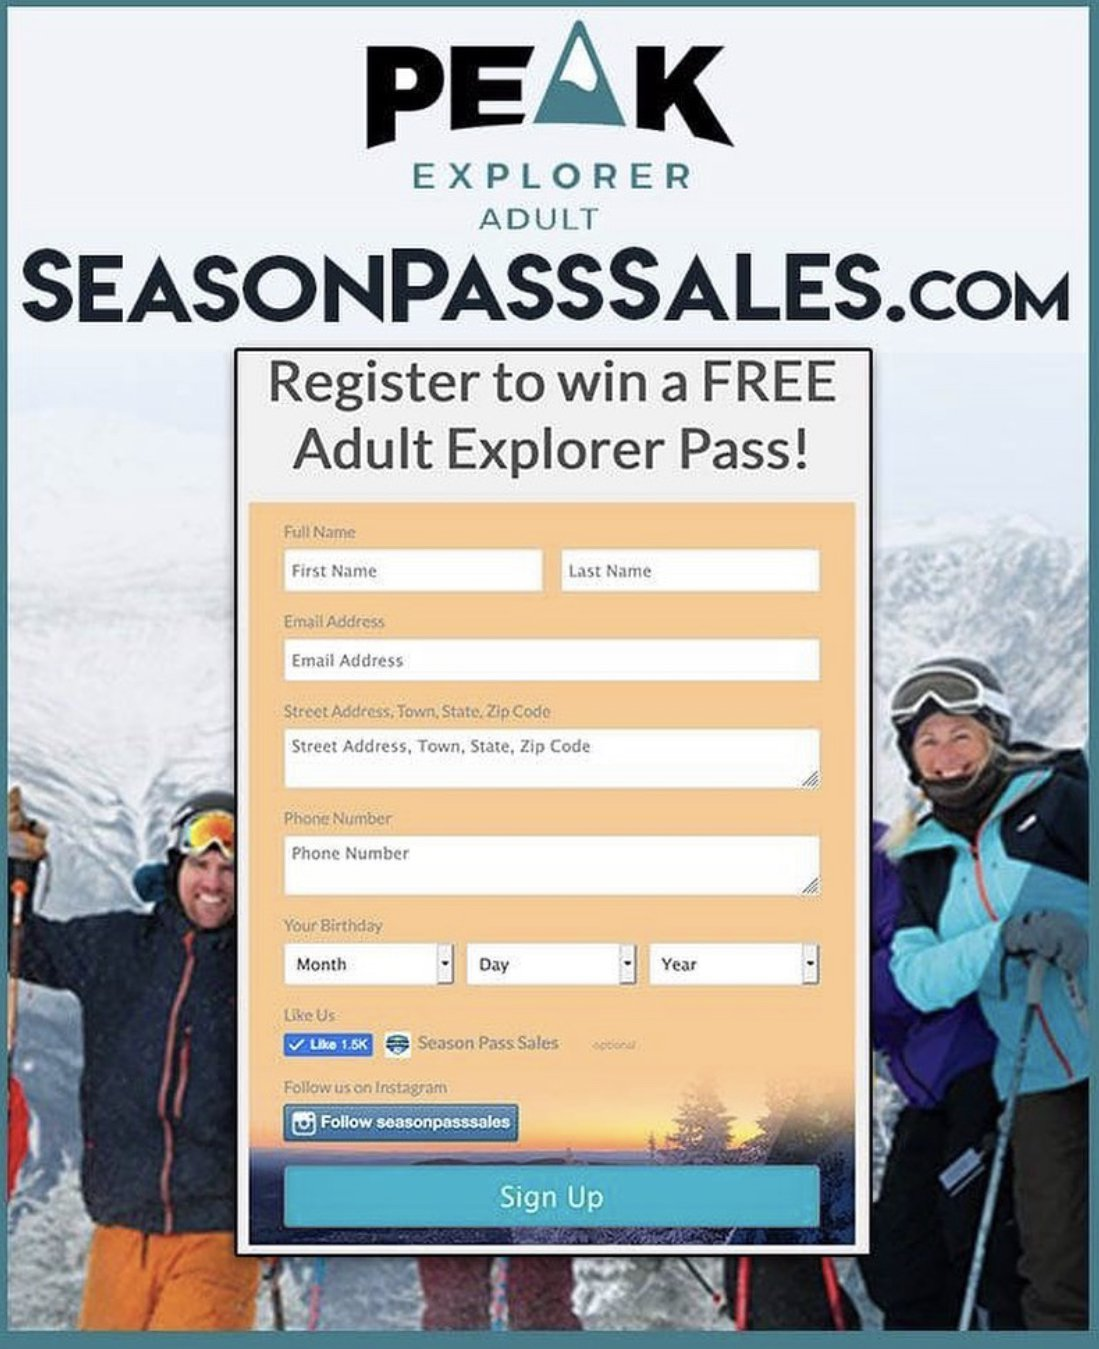 I'm giving away a FREE 2019/2020 Peak Pass